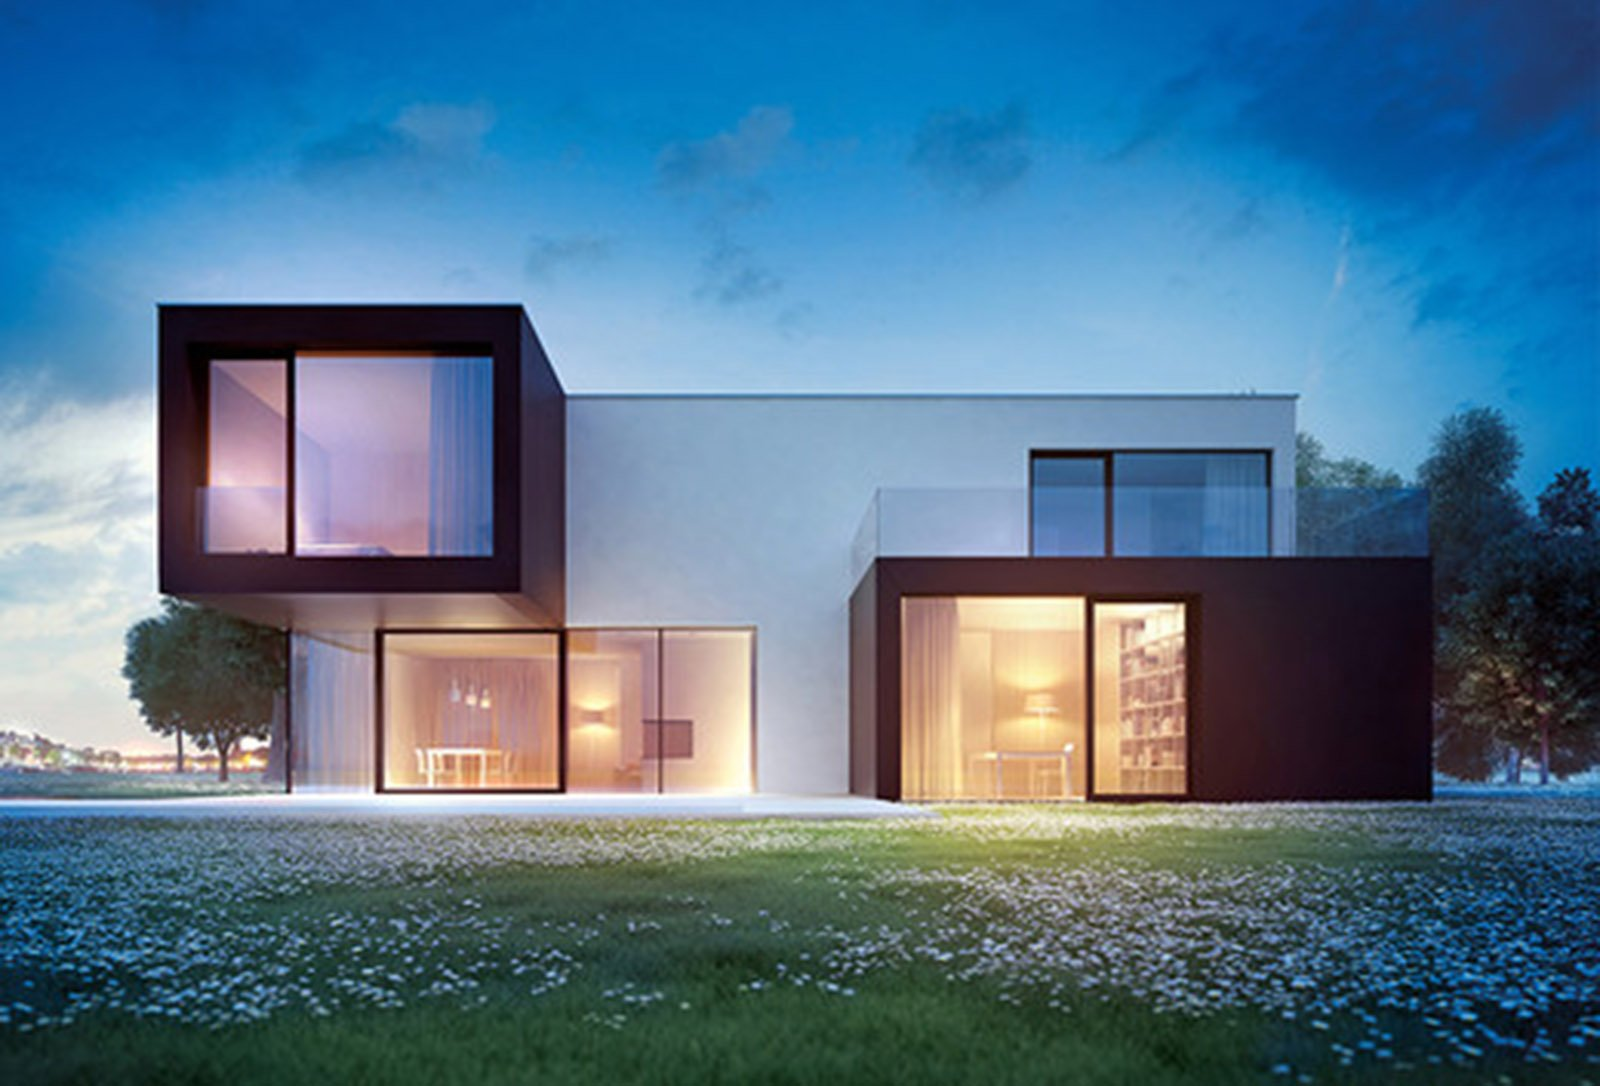 Bioarchitettura e case ecologiche prefabbricate in legno - Case moderne in legno ...